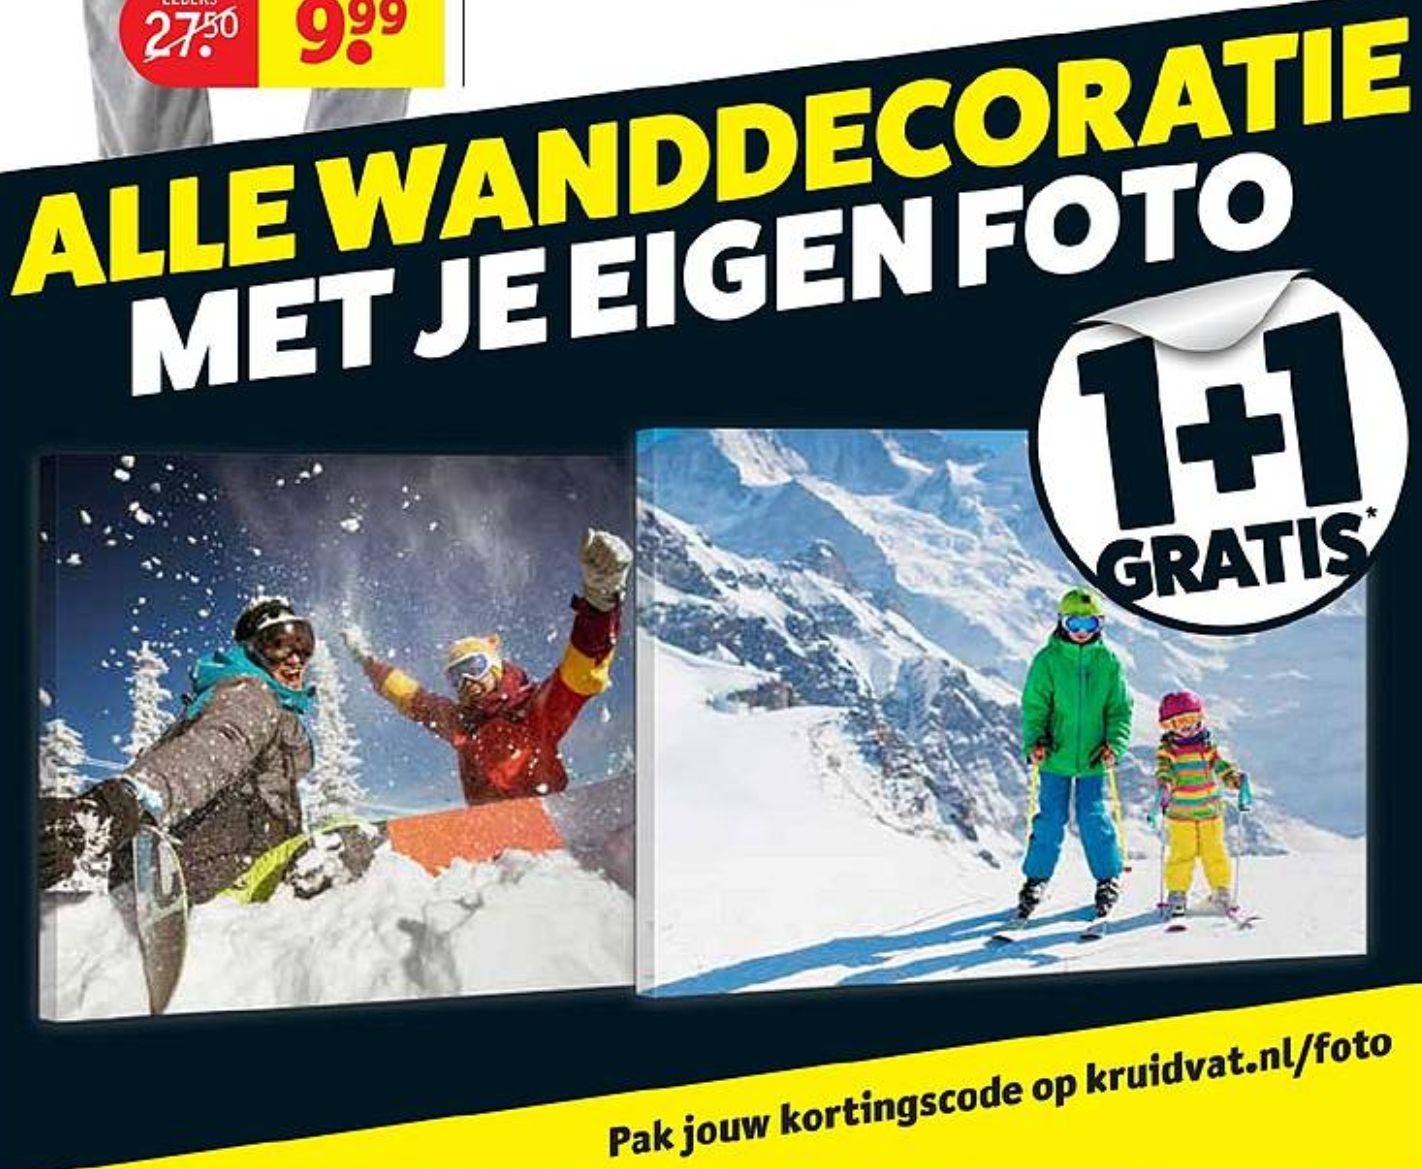 (1+1 gratis) op alle wanddecoratie met je eigen foto @Kruidvat